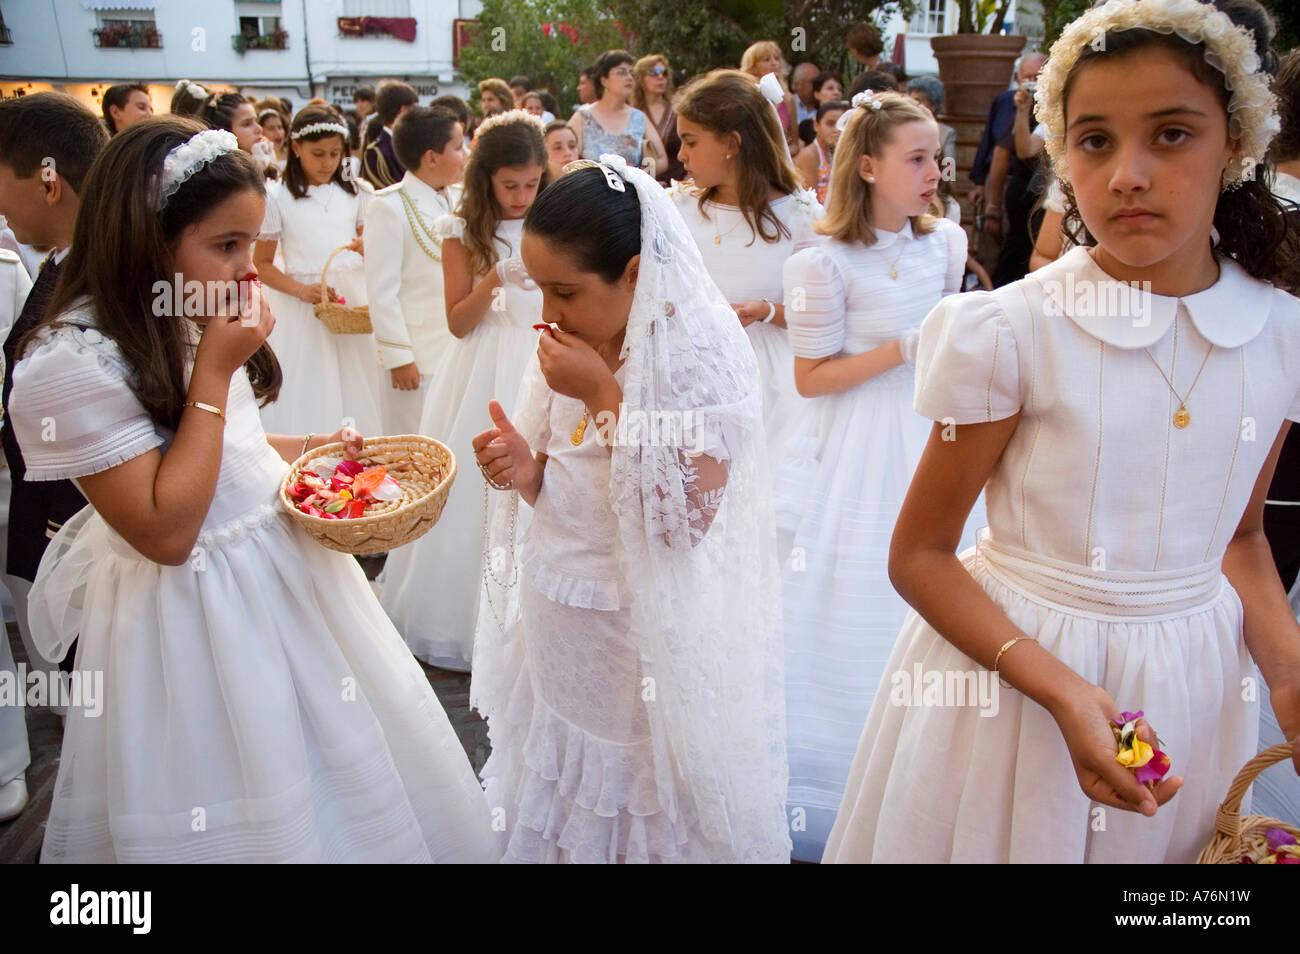 corpus christi girls How did corpus christi texas get its name in 1519, on the roman catholic feast day of corpus christi, spanish explorer alonzo alvarez de pineda discovered a lush.